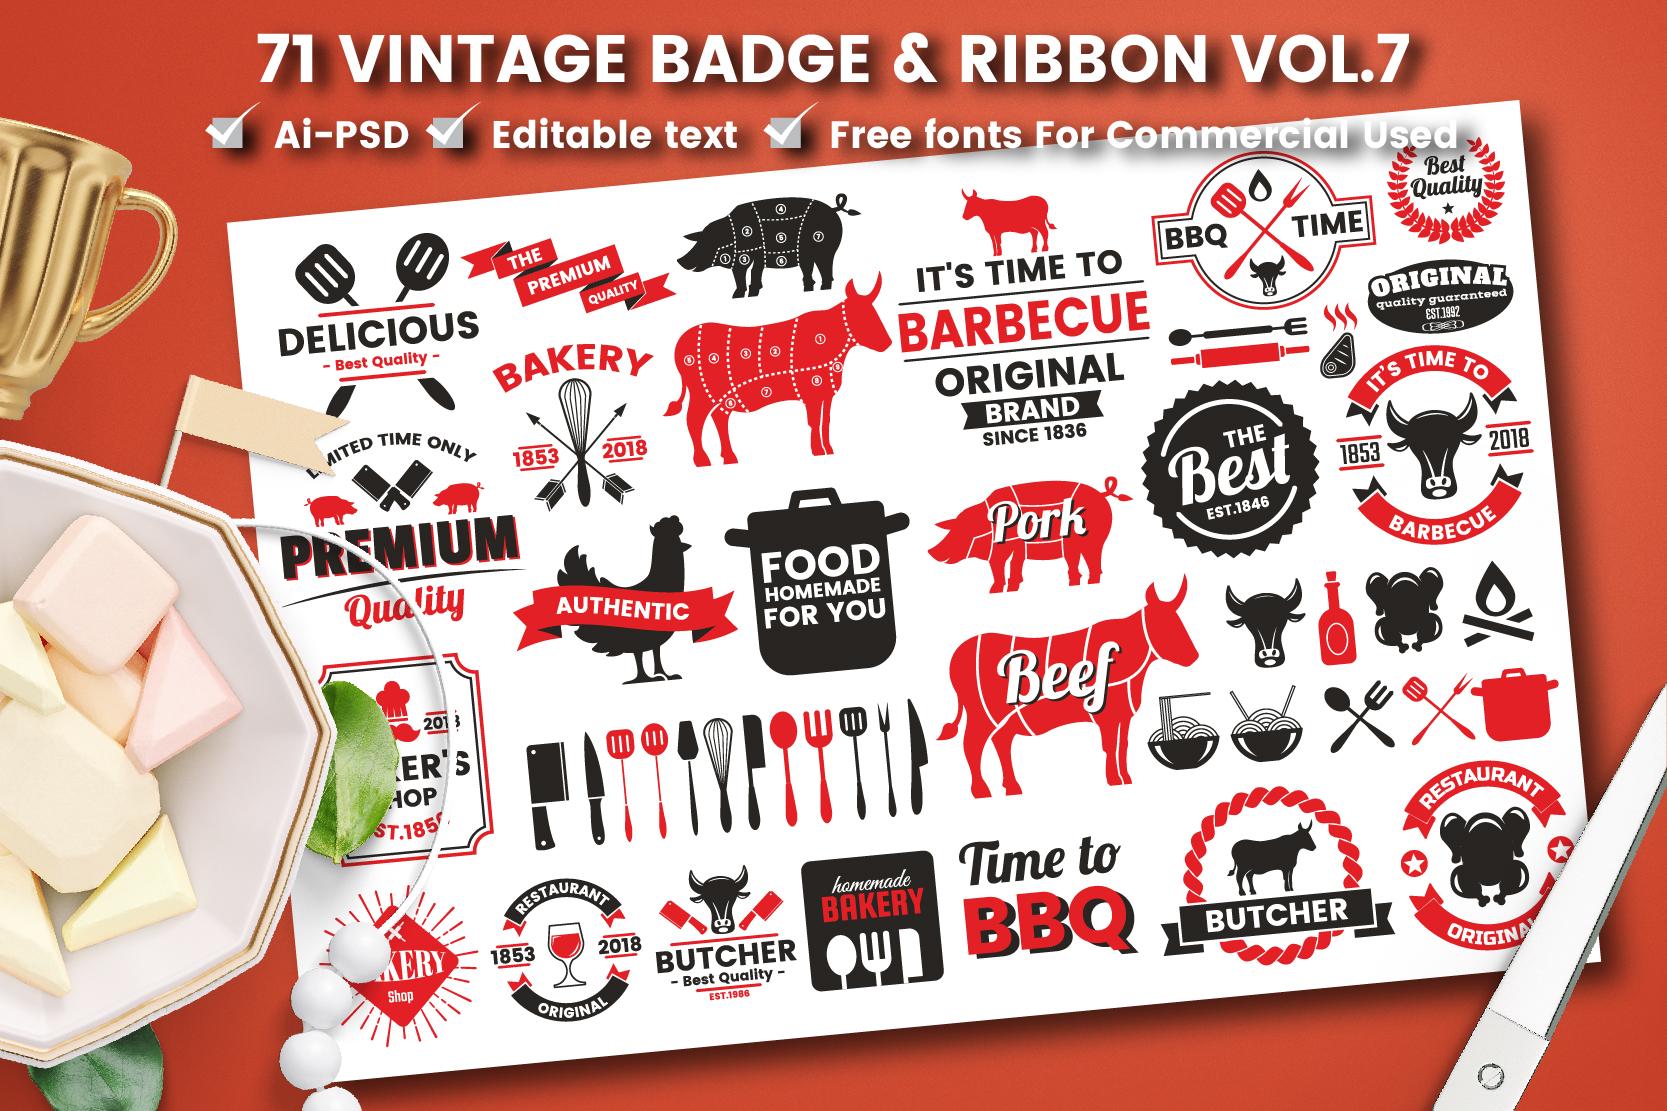 71 VINTAGE BADGE & RIBBON Vol.7 example image 1